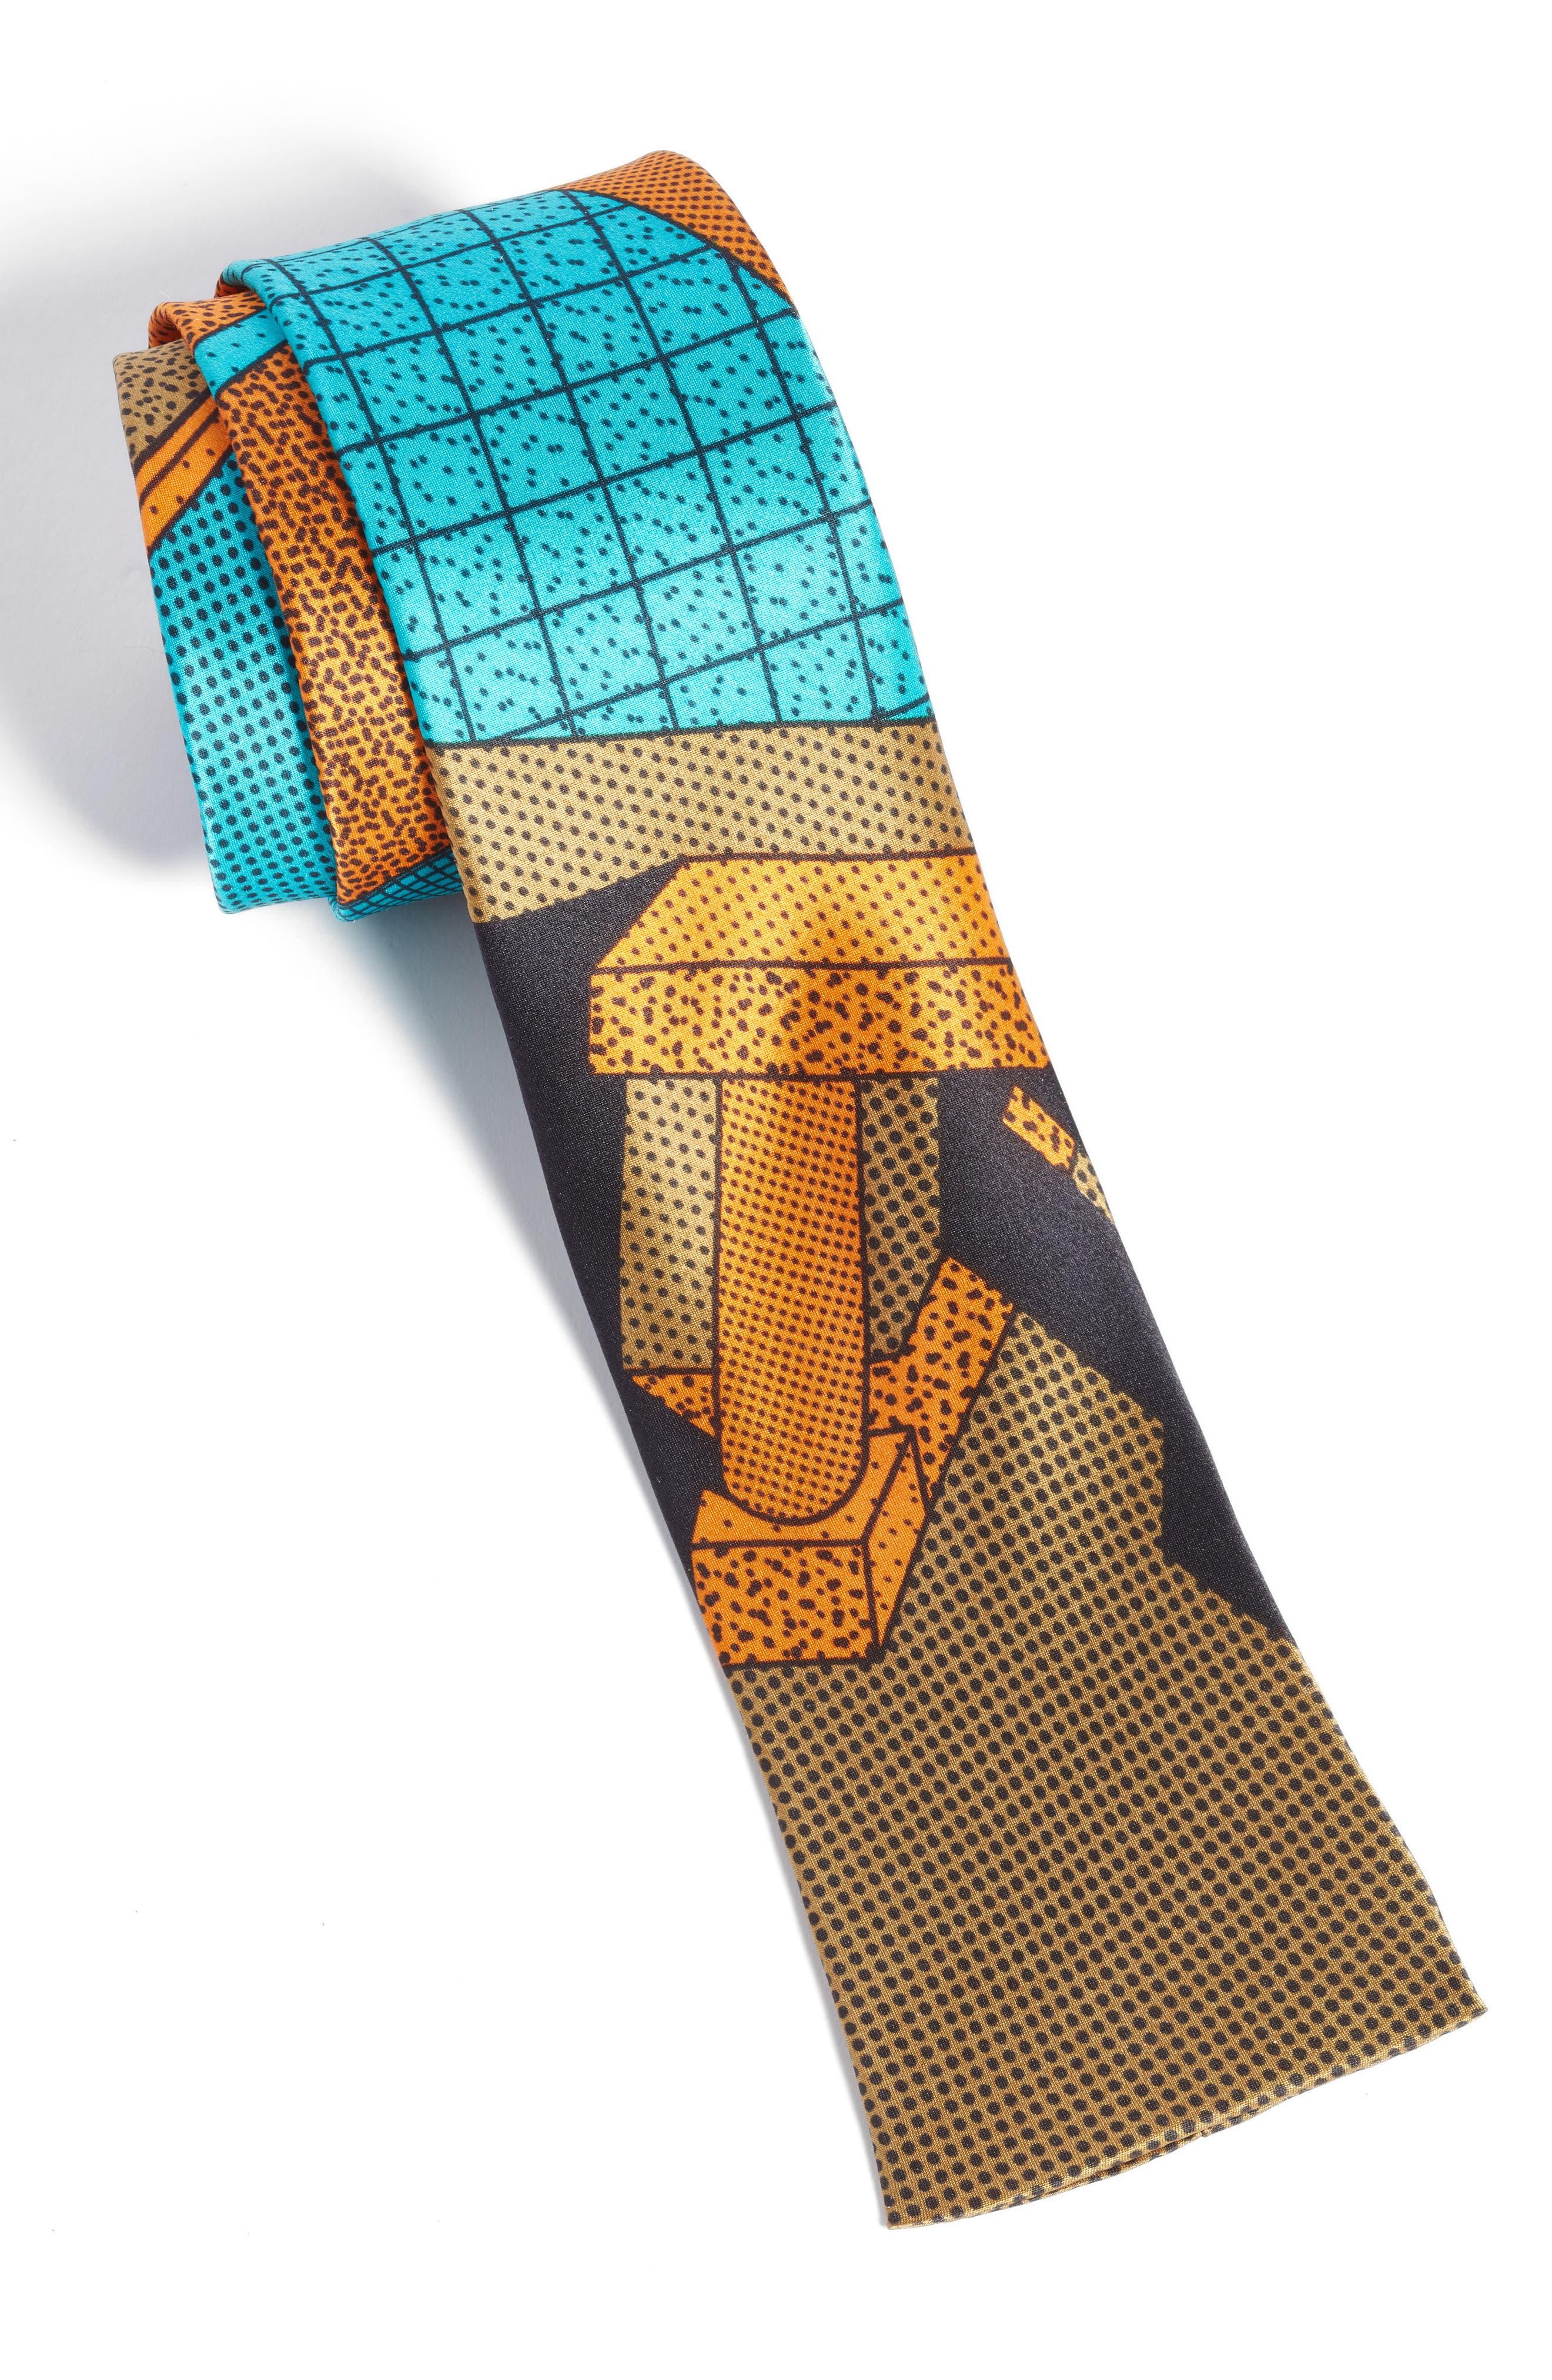 MEMPHIS Milano Teal/Orange Print Silk Tie,                             Alternate thumbnail 3, color,                             440